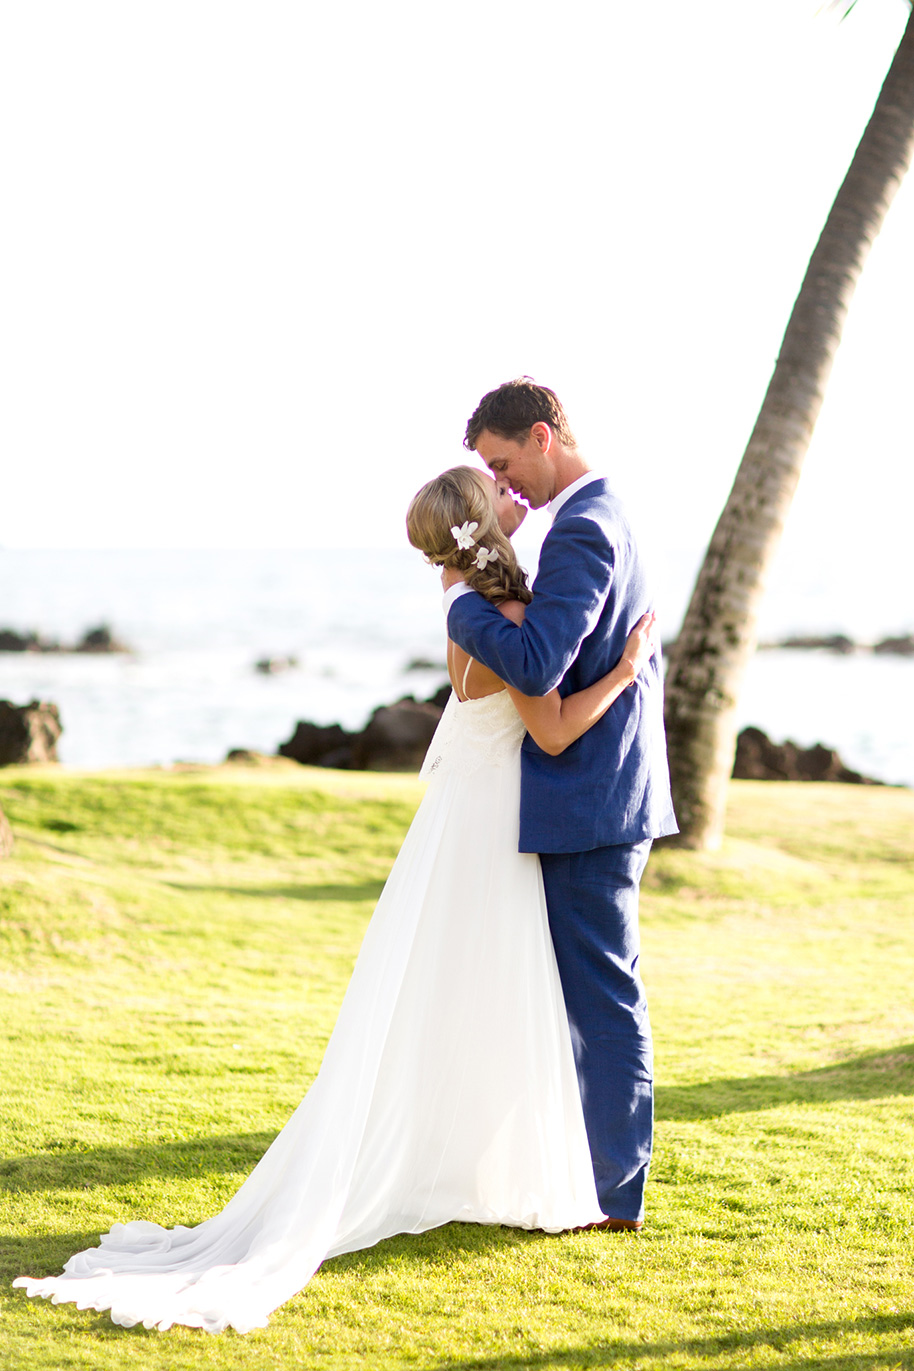 Maui-Wedding-060216-10